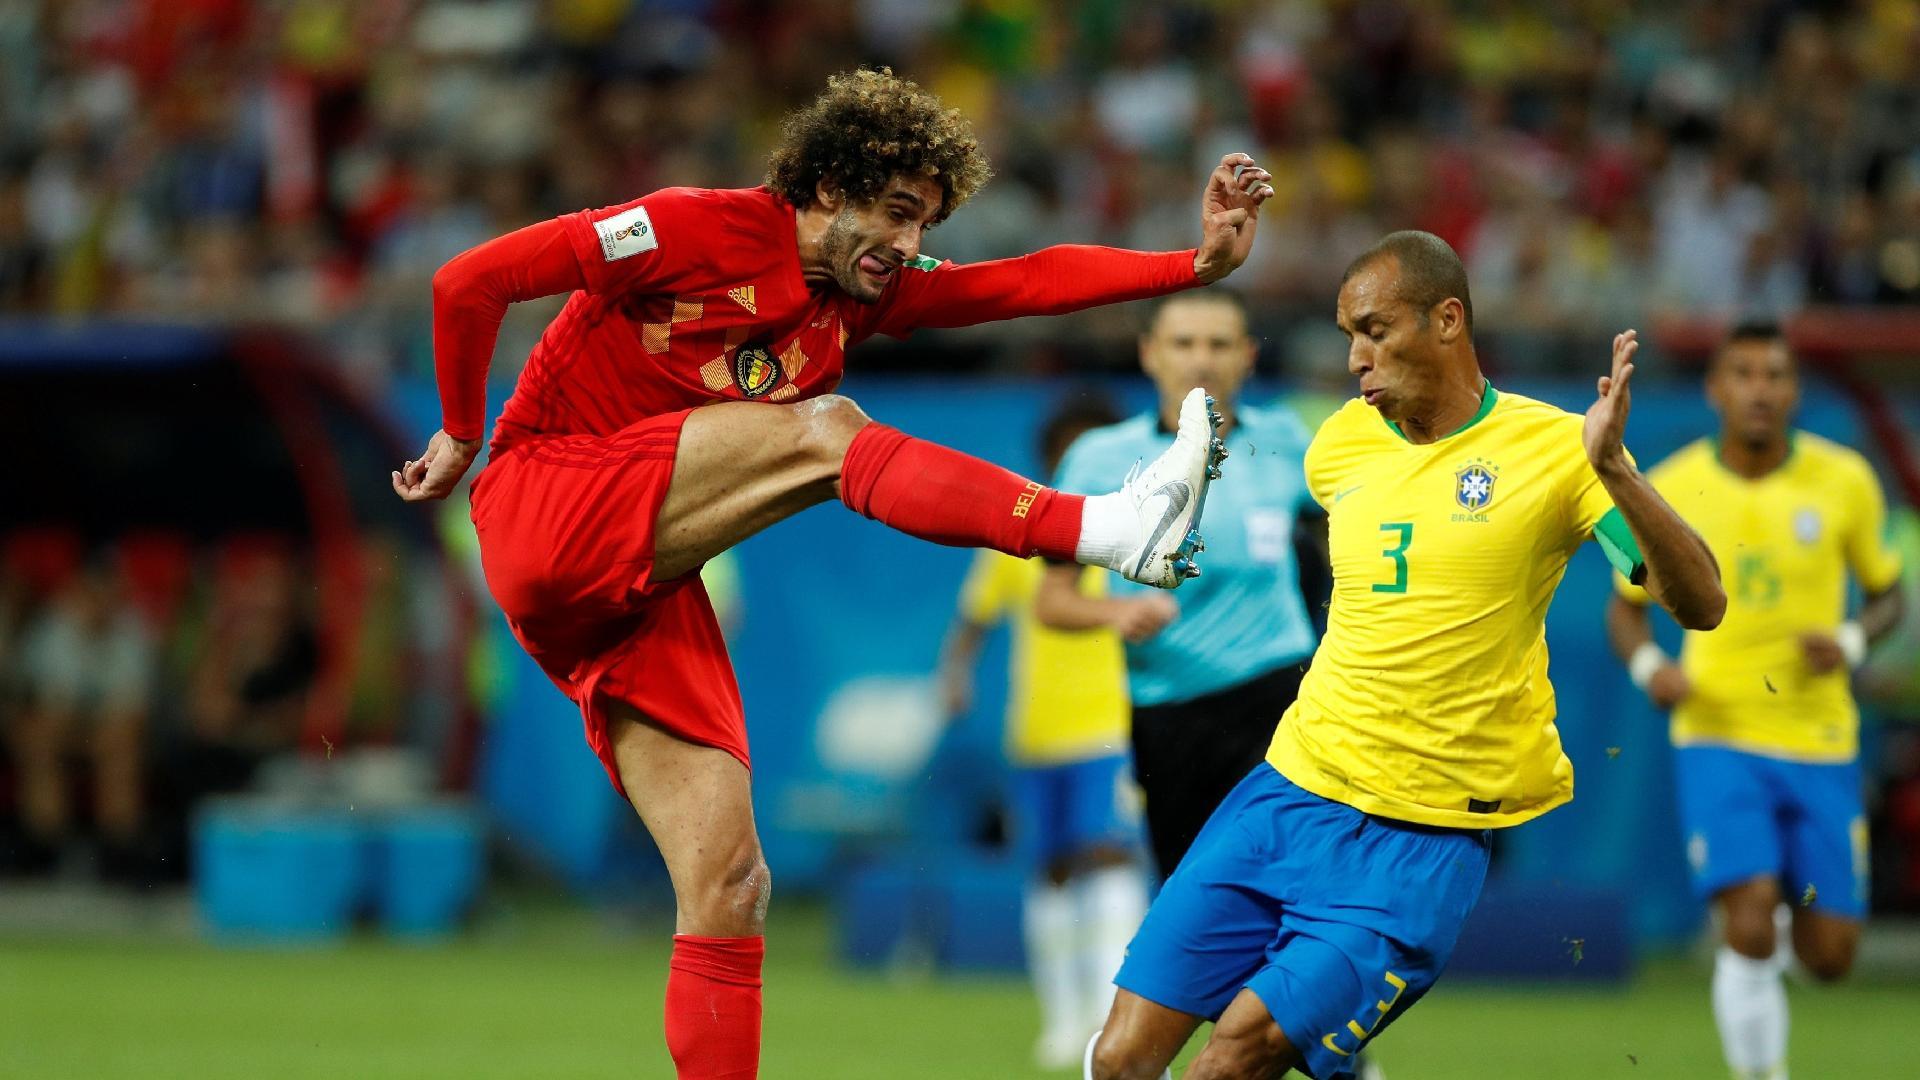 Miranda bloqueia chute de Marouane Fellaini em Brasil x Bélgica